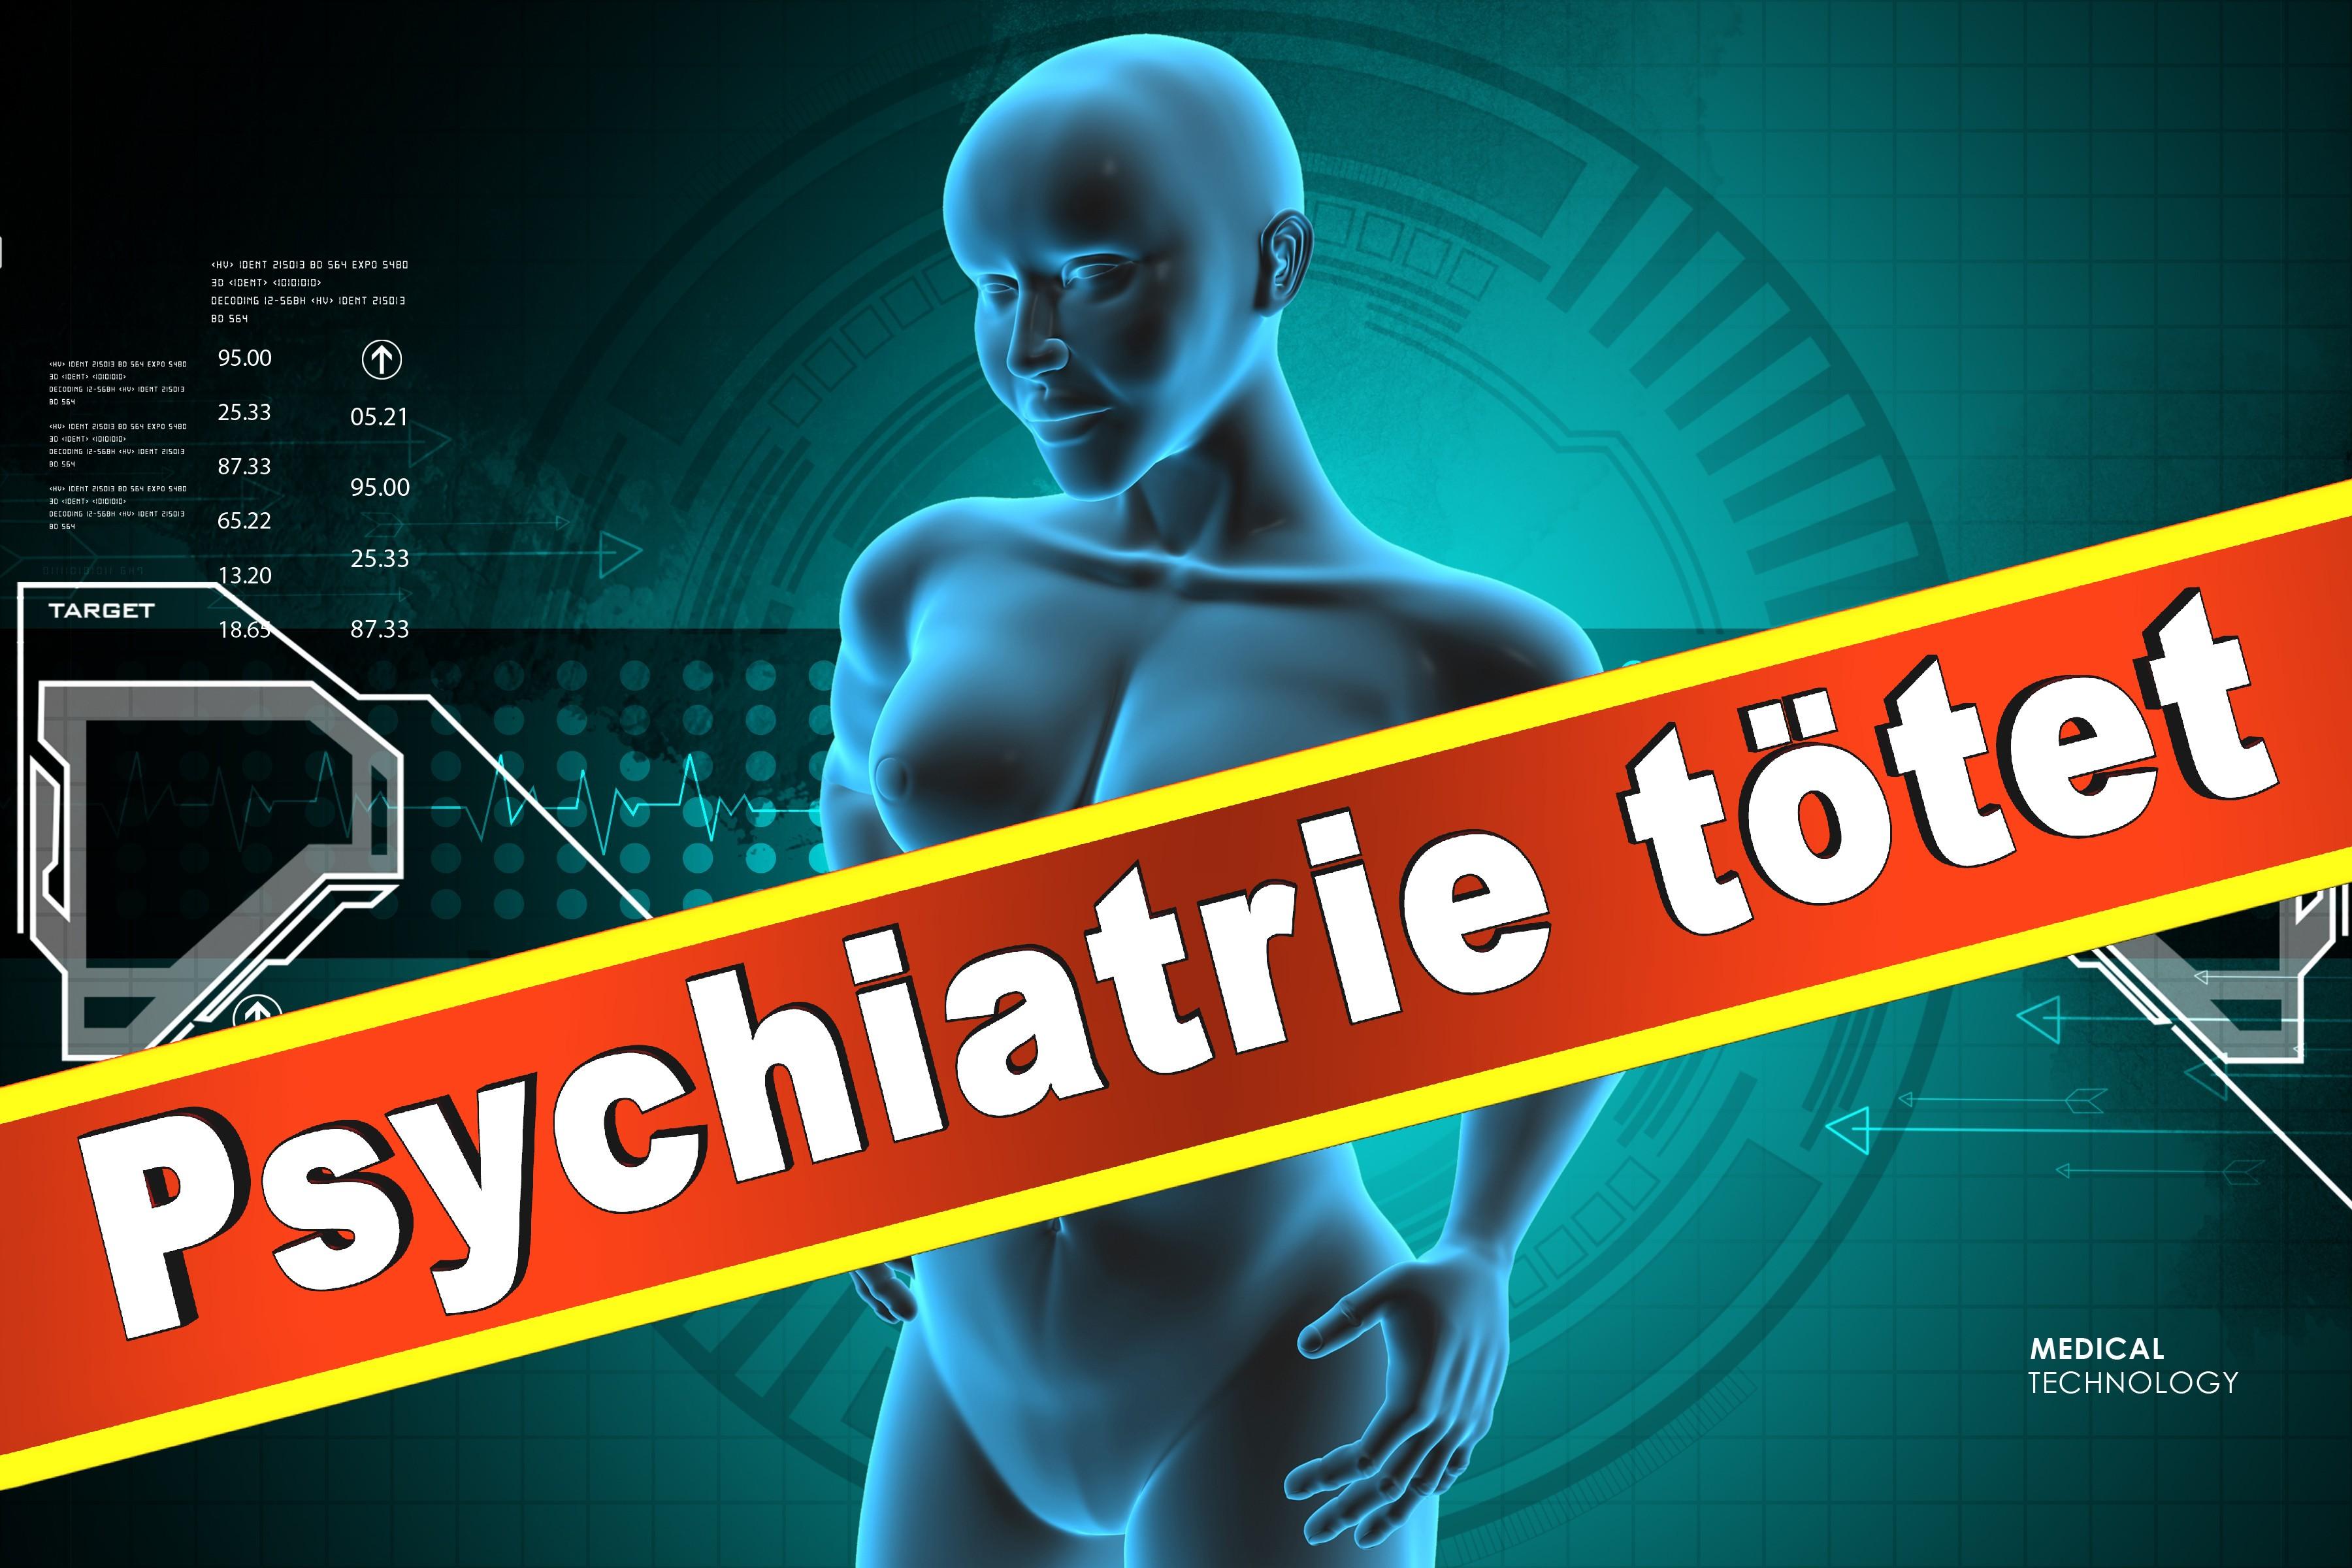 Sozialpsychiatrie Psychotherapie Psychiatrie Psychiatrische Klinik Krankenhaus Hannover